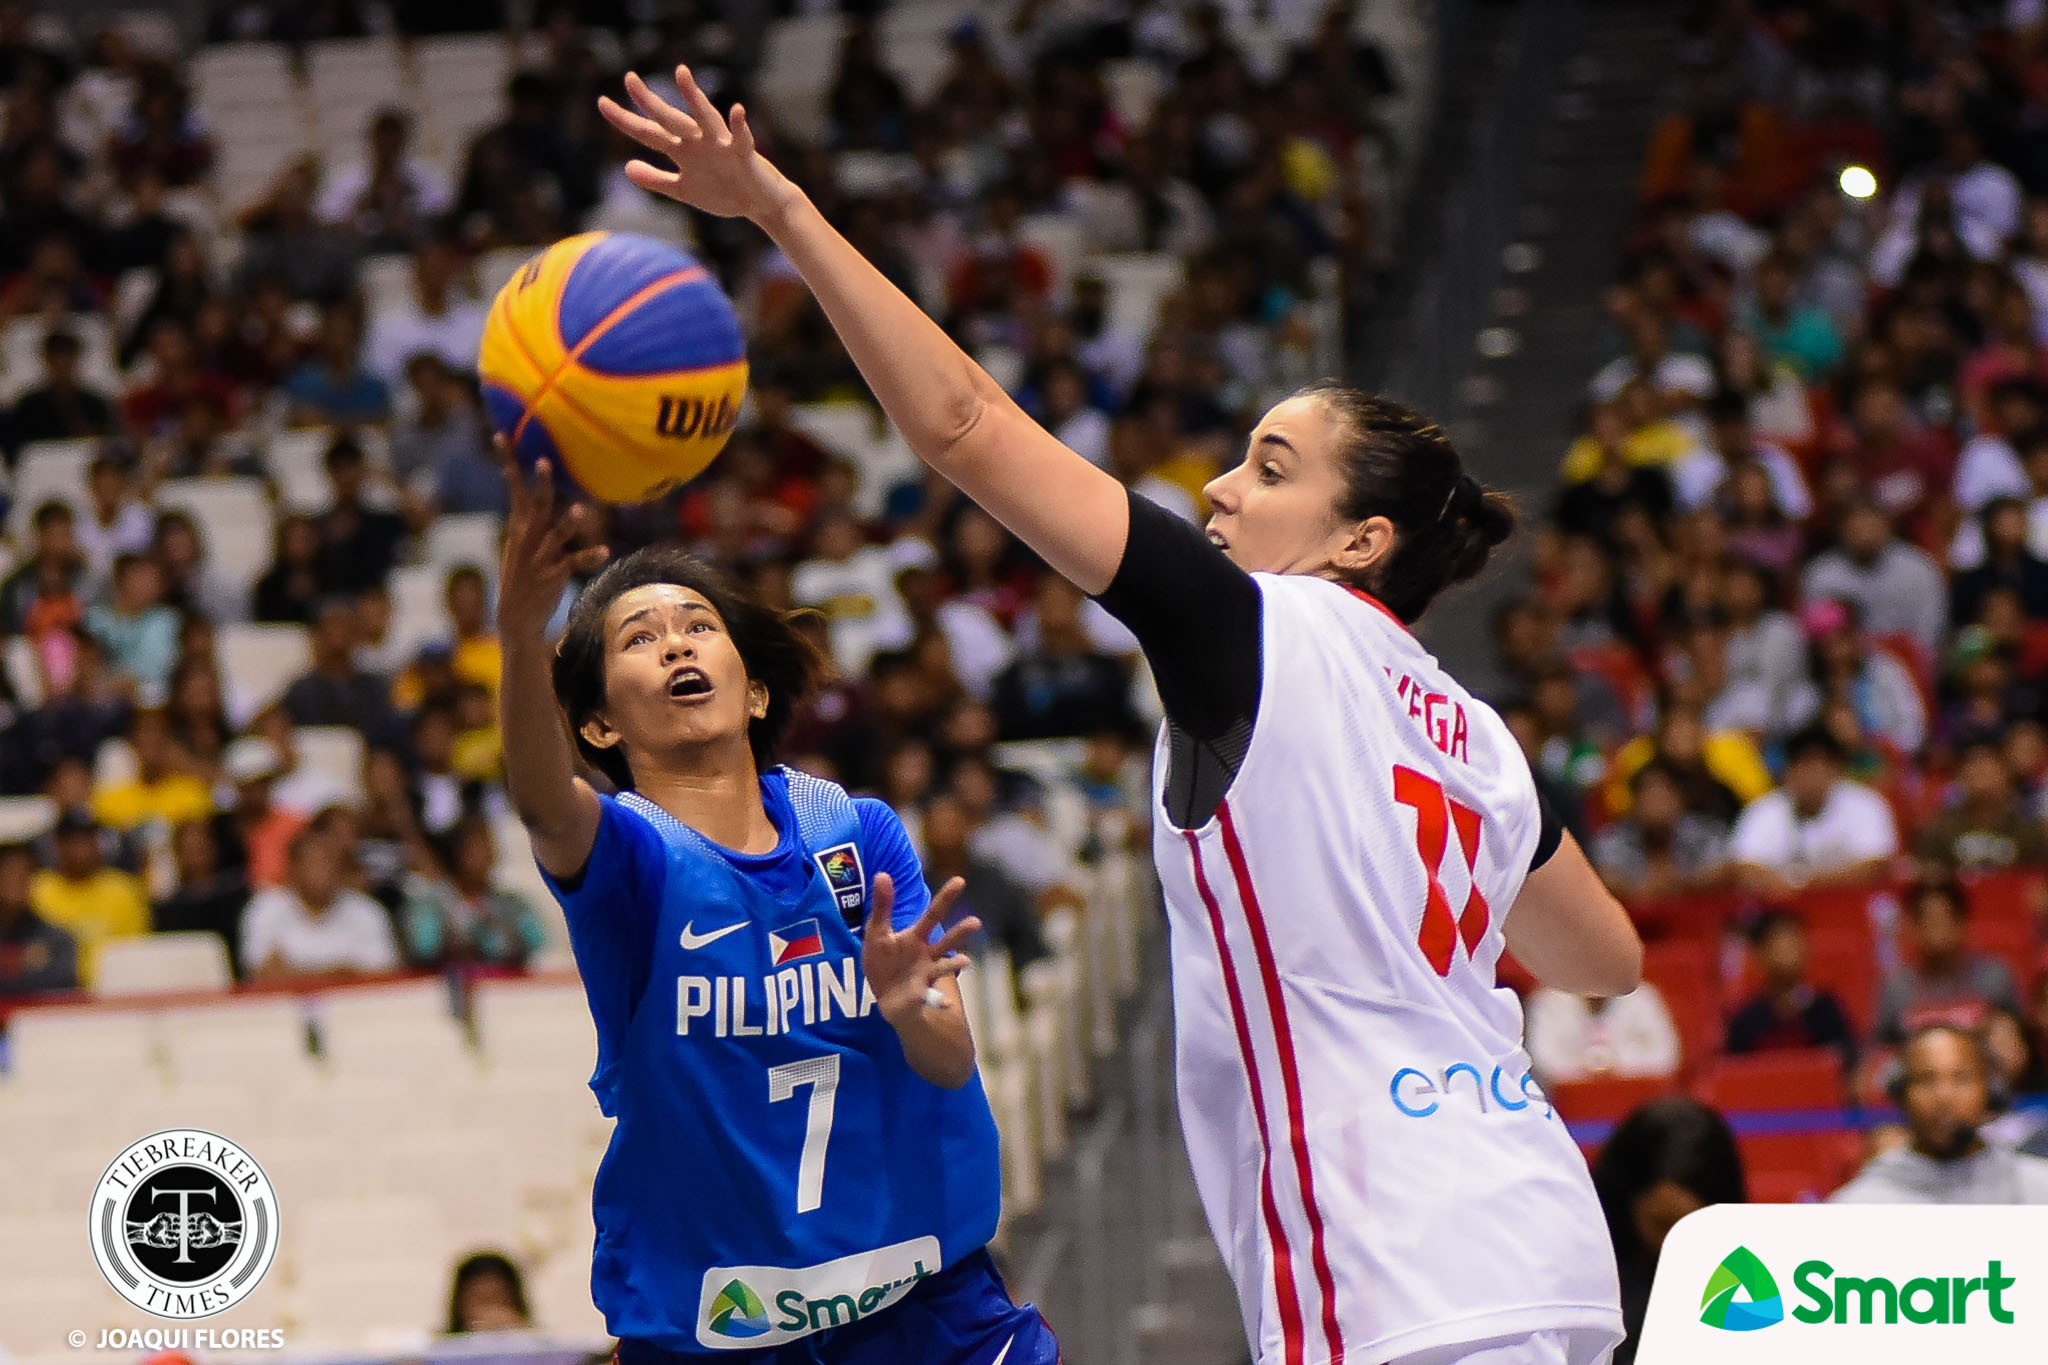 FIBA 3X3 Philippines vs. Spain – Pontejos-9665